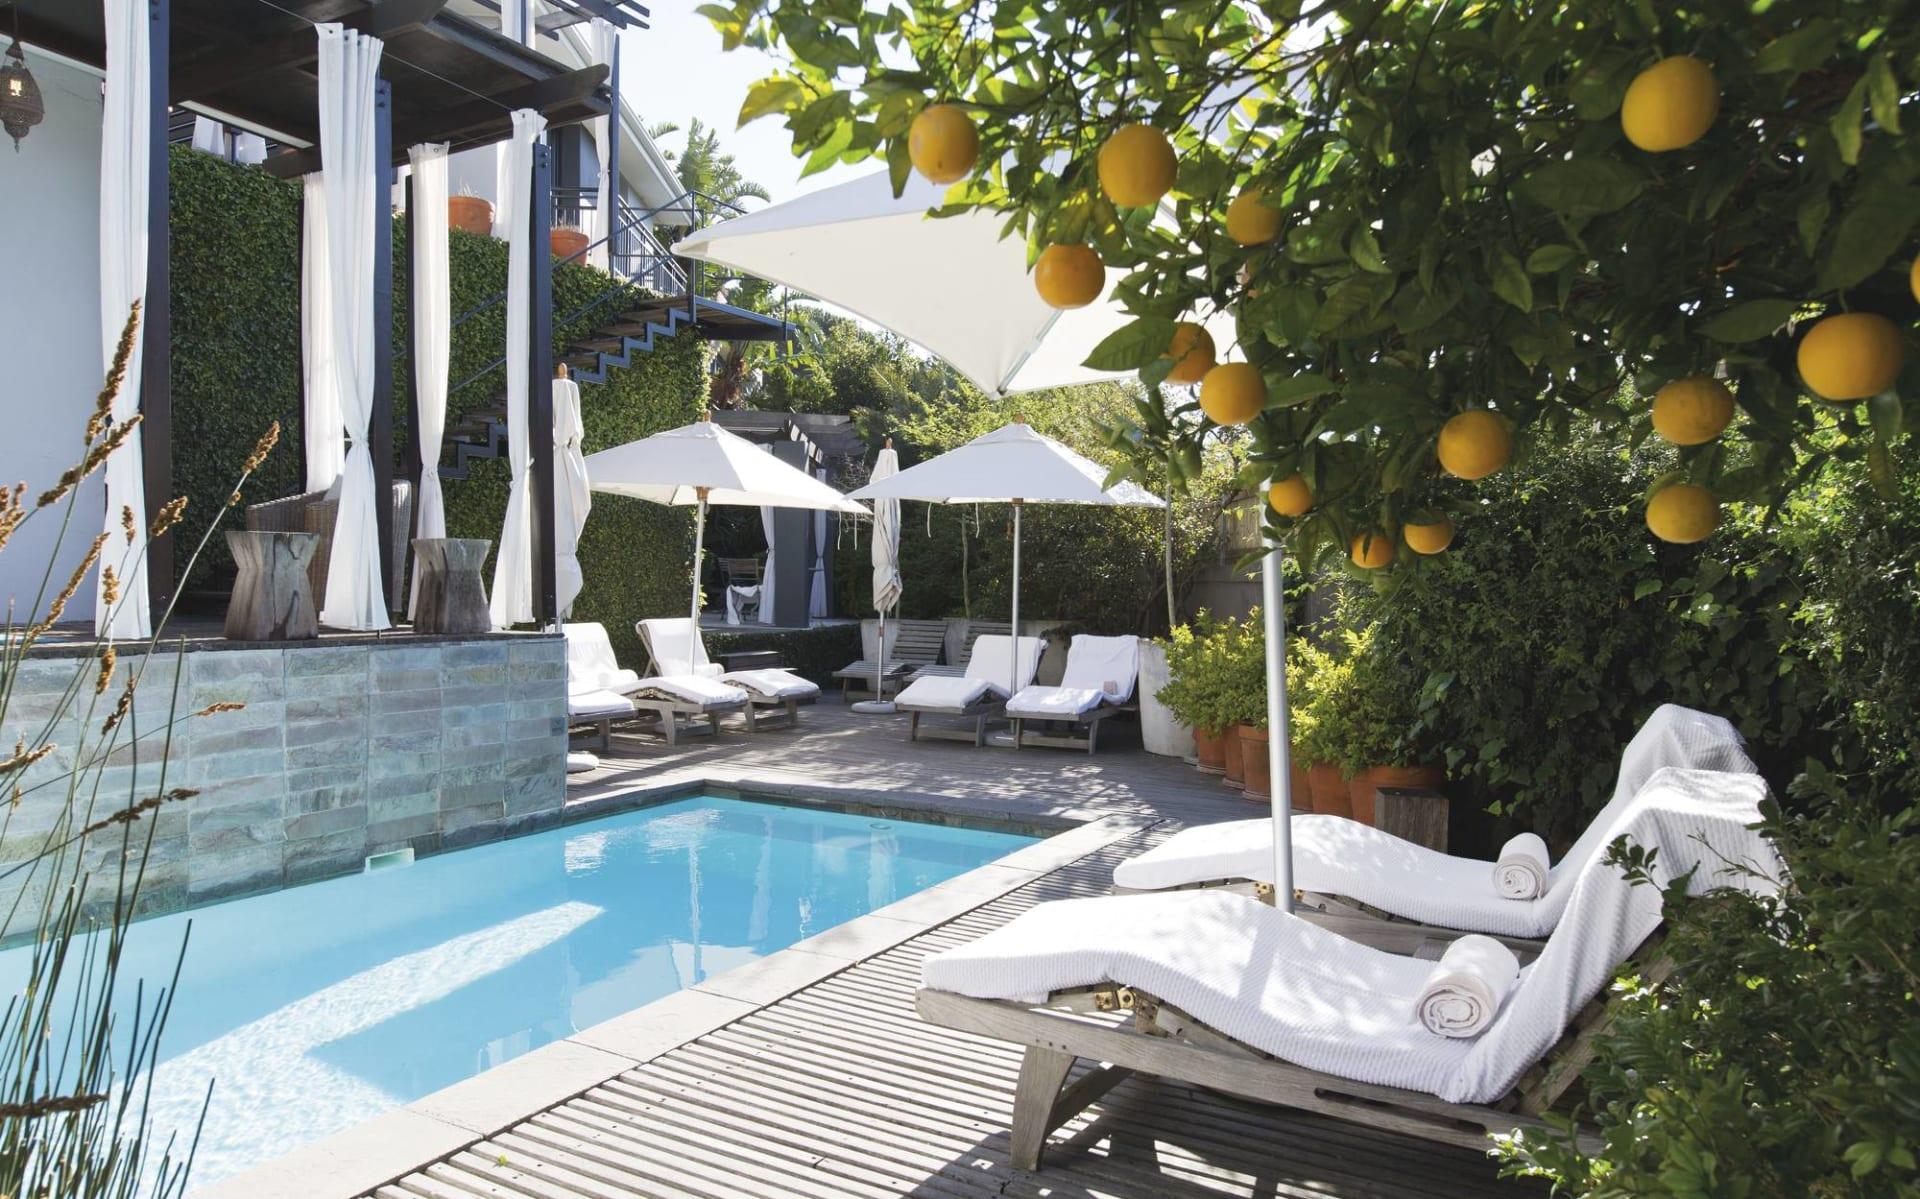 Kensington Place in Kapstadt: pool Kensington Place - Pool im Garten mit Liegestuehlen